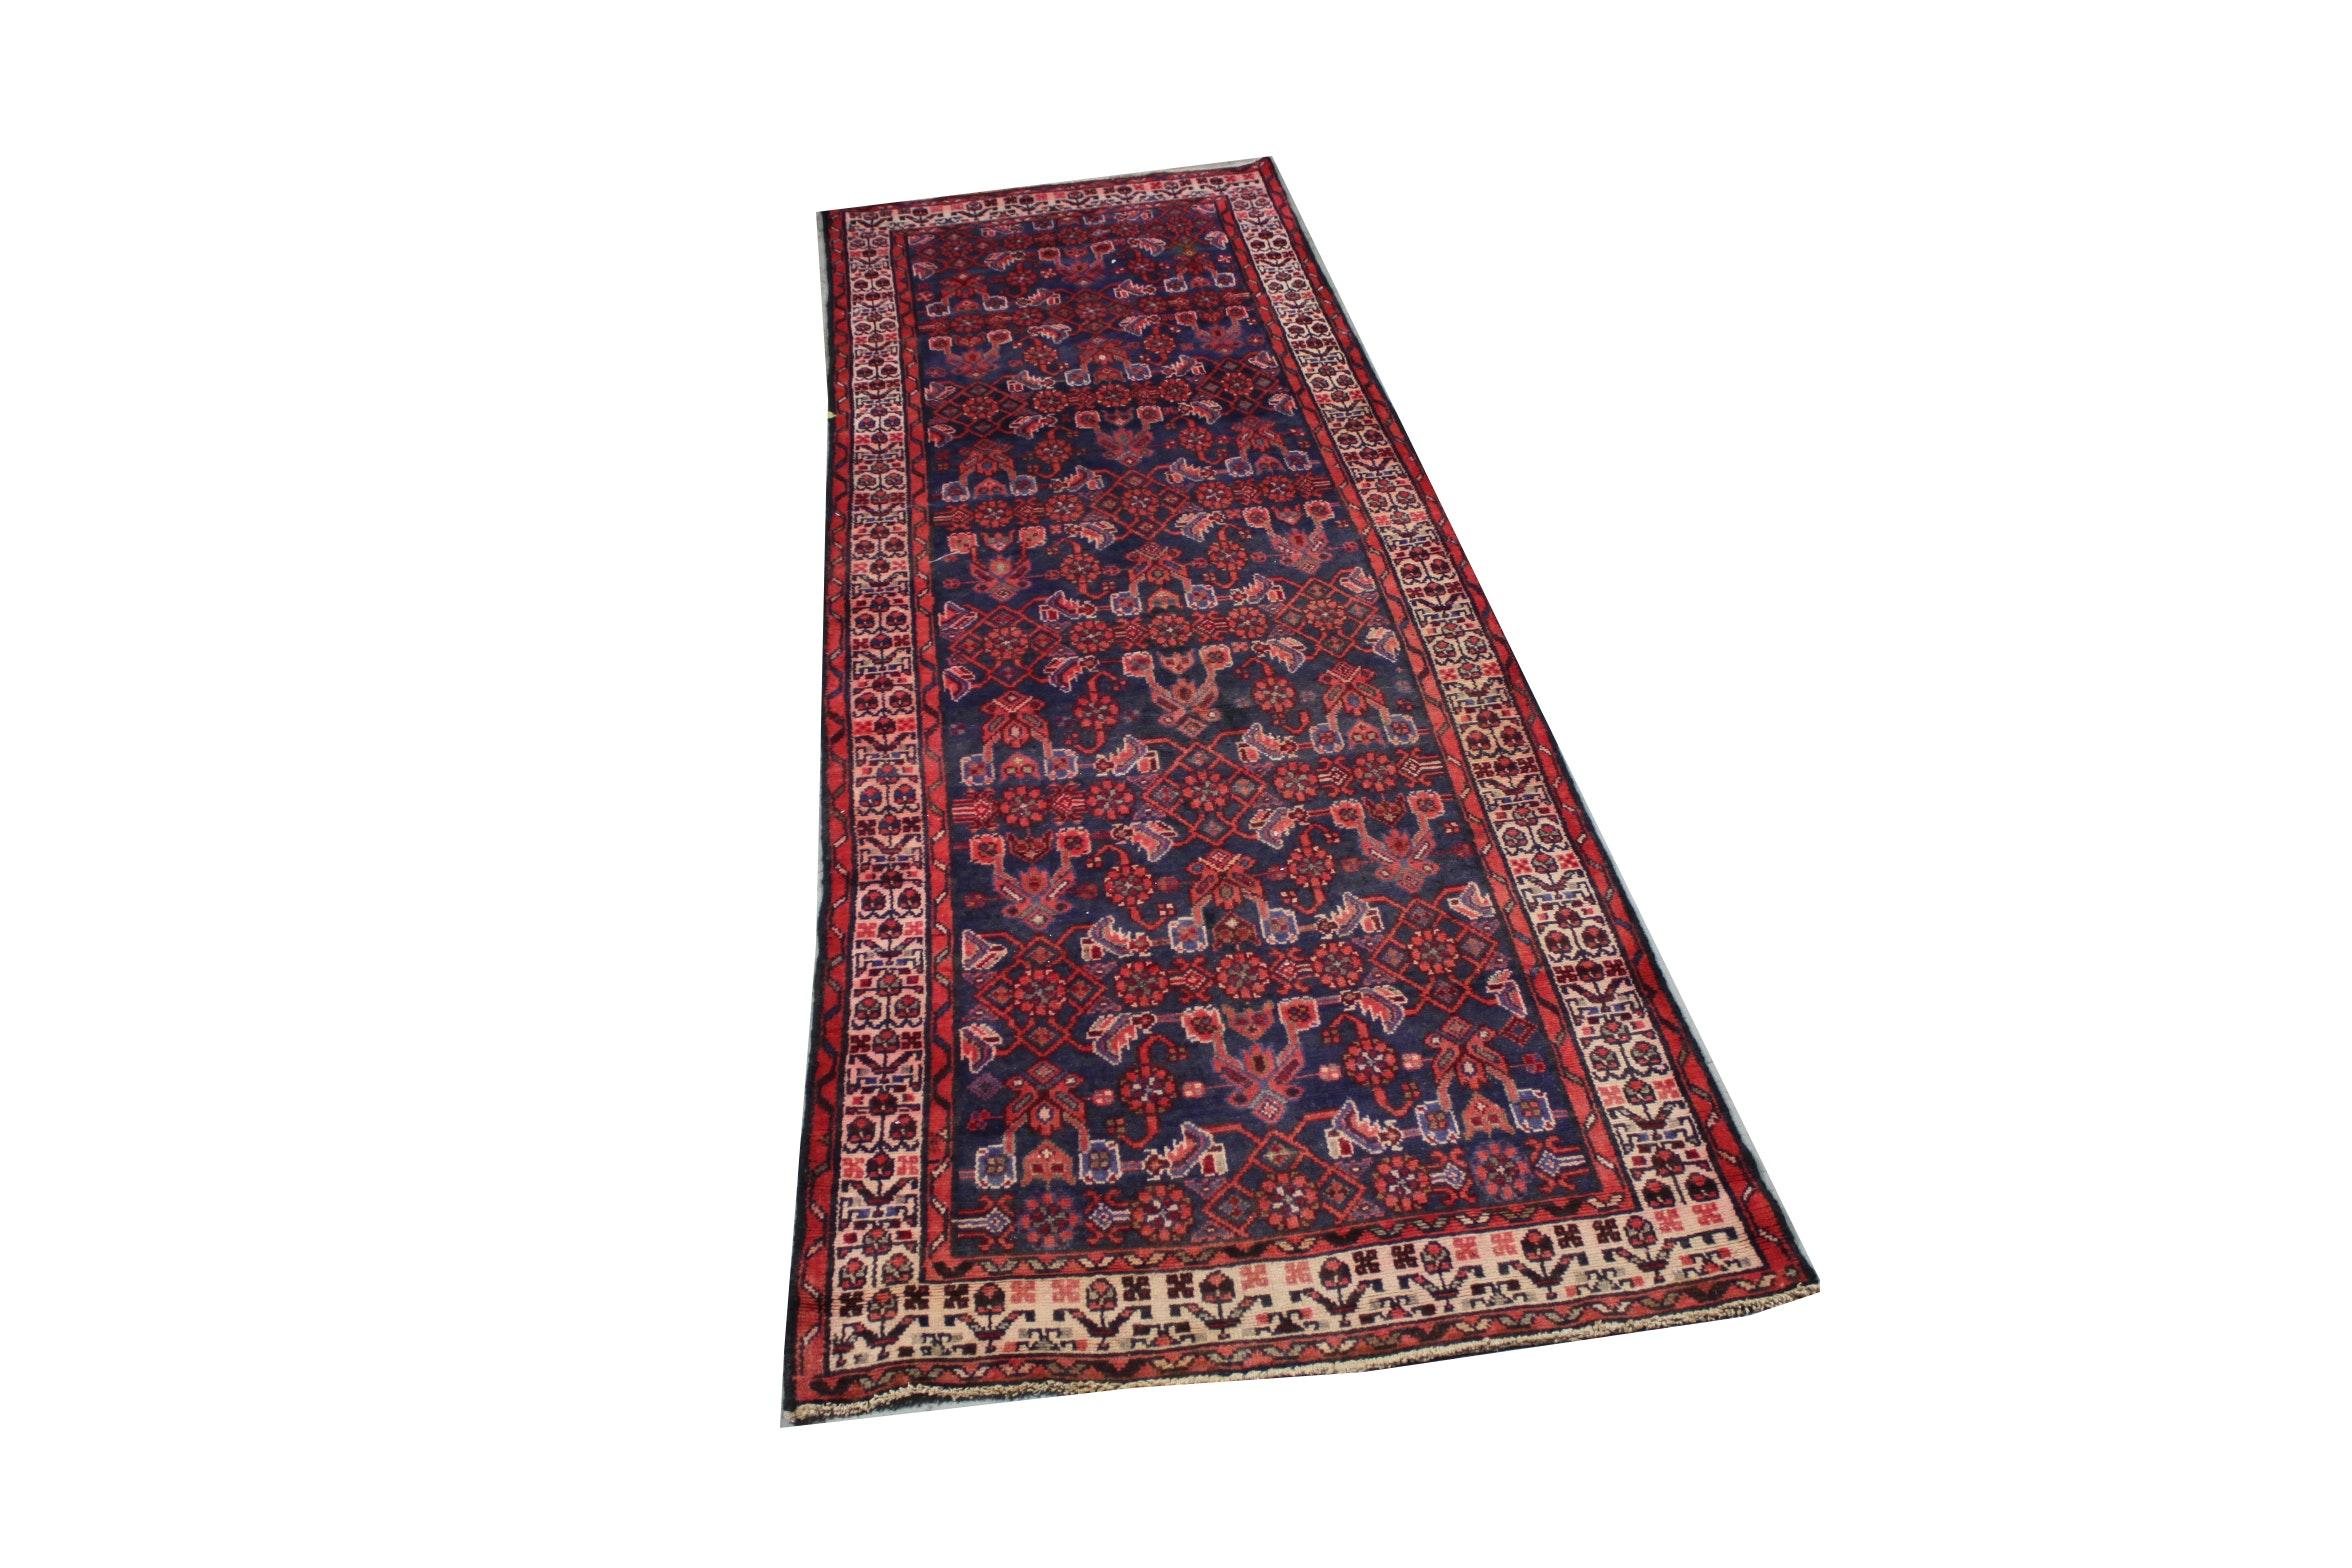 Hand-Knotted Persian Lilihan Wool Carpet Runner